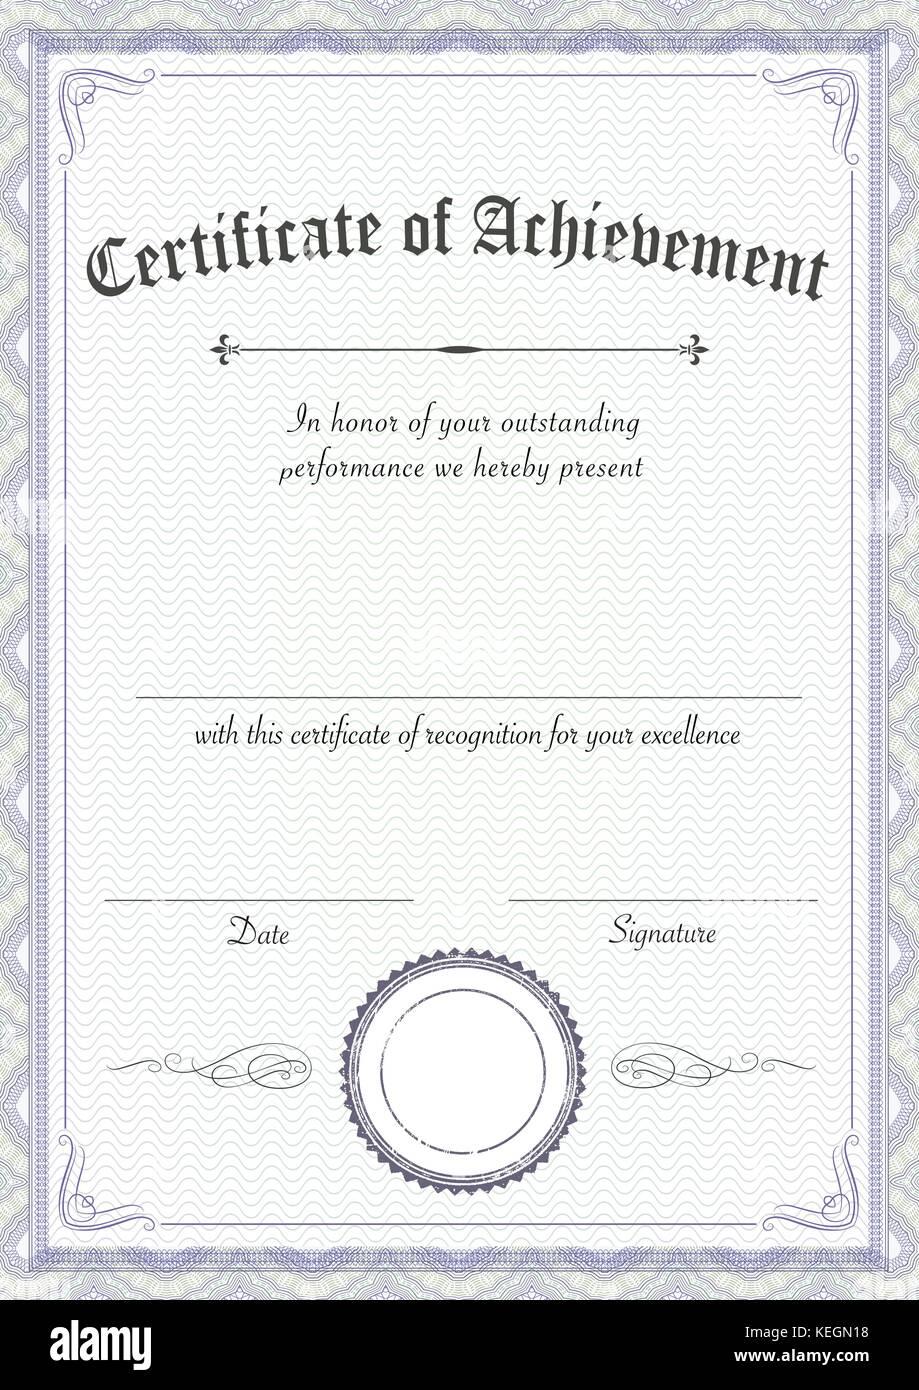 Wunderbar Zertifikat Papier Vorlage Bilder - Entry Level Resume ...